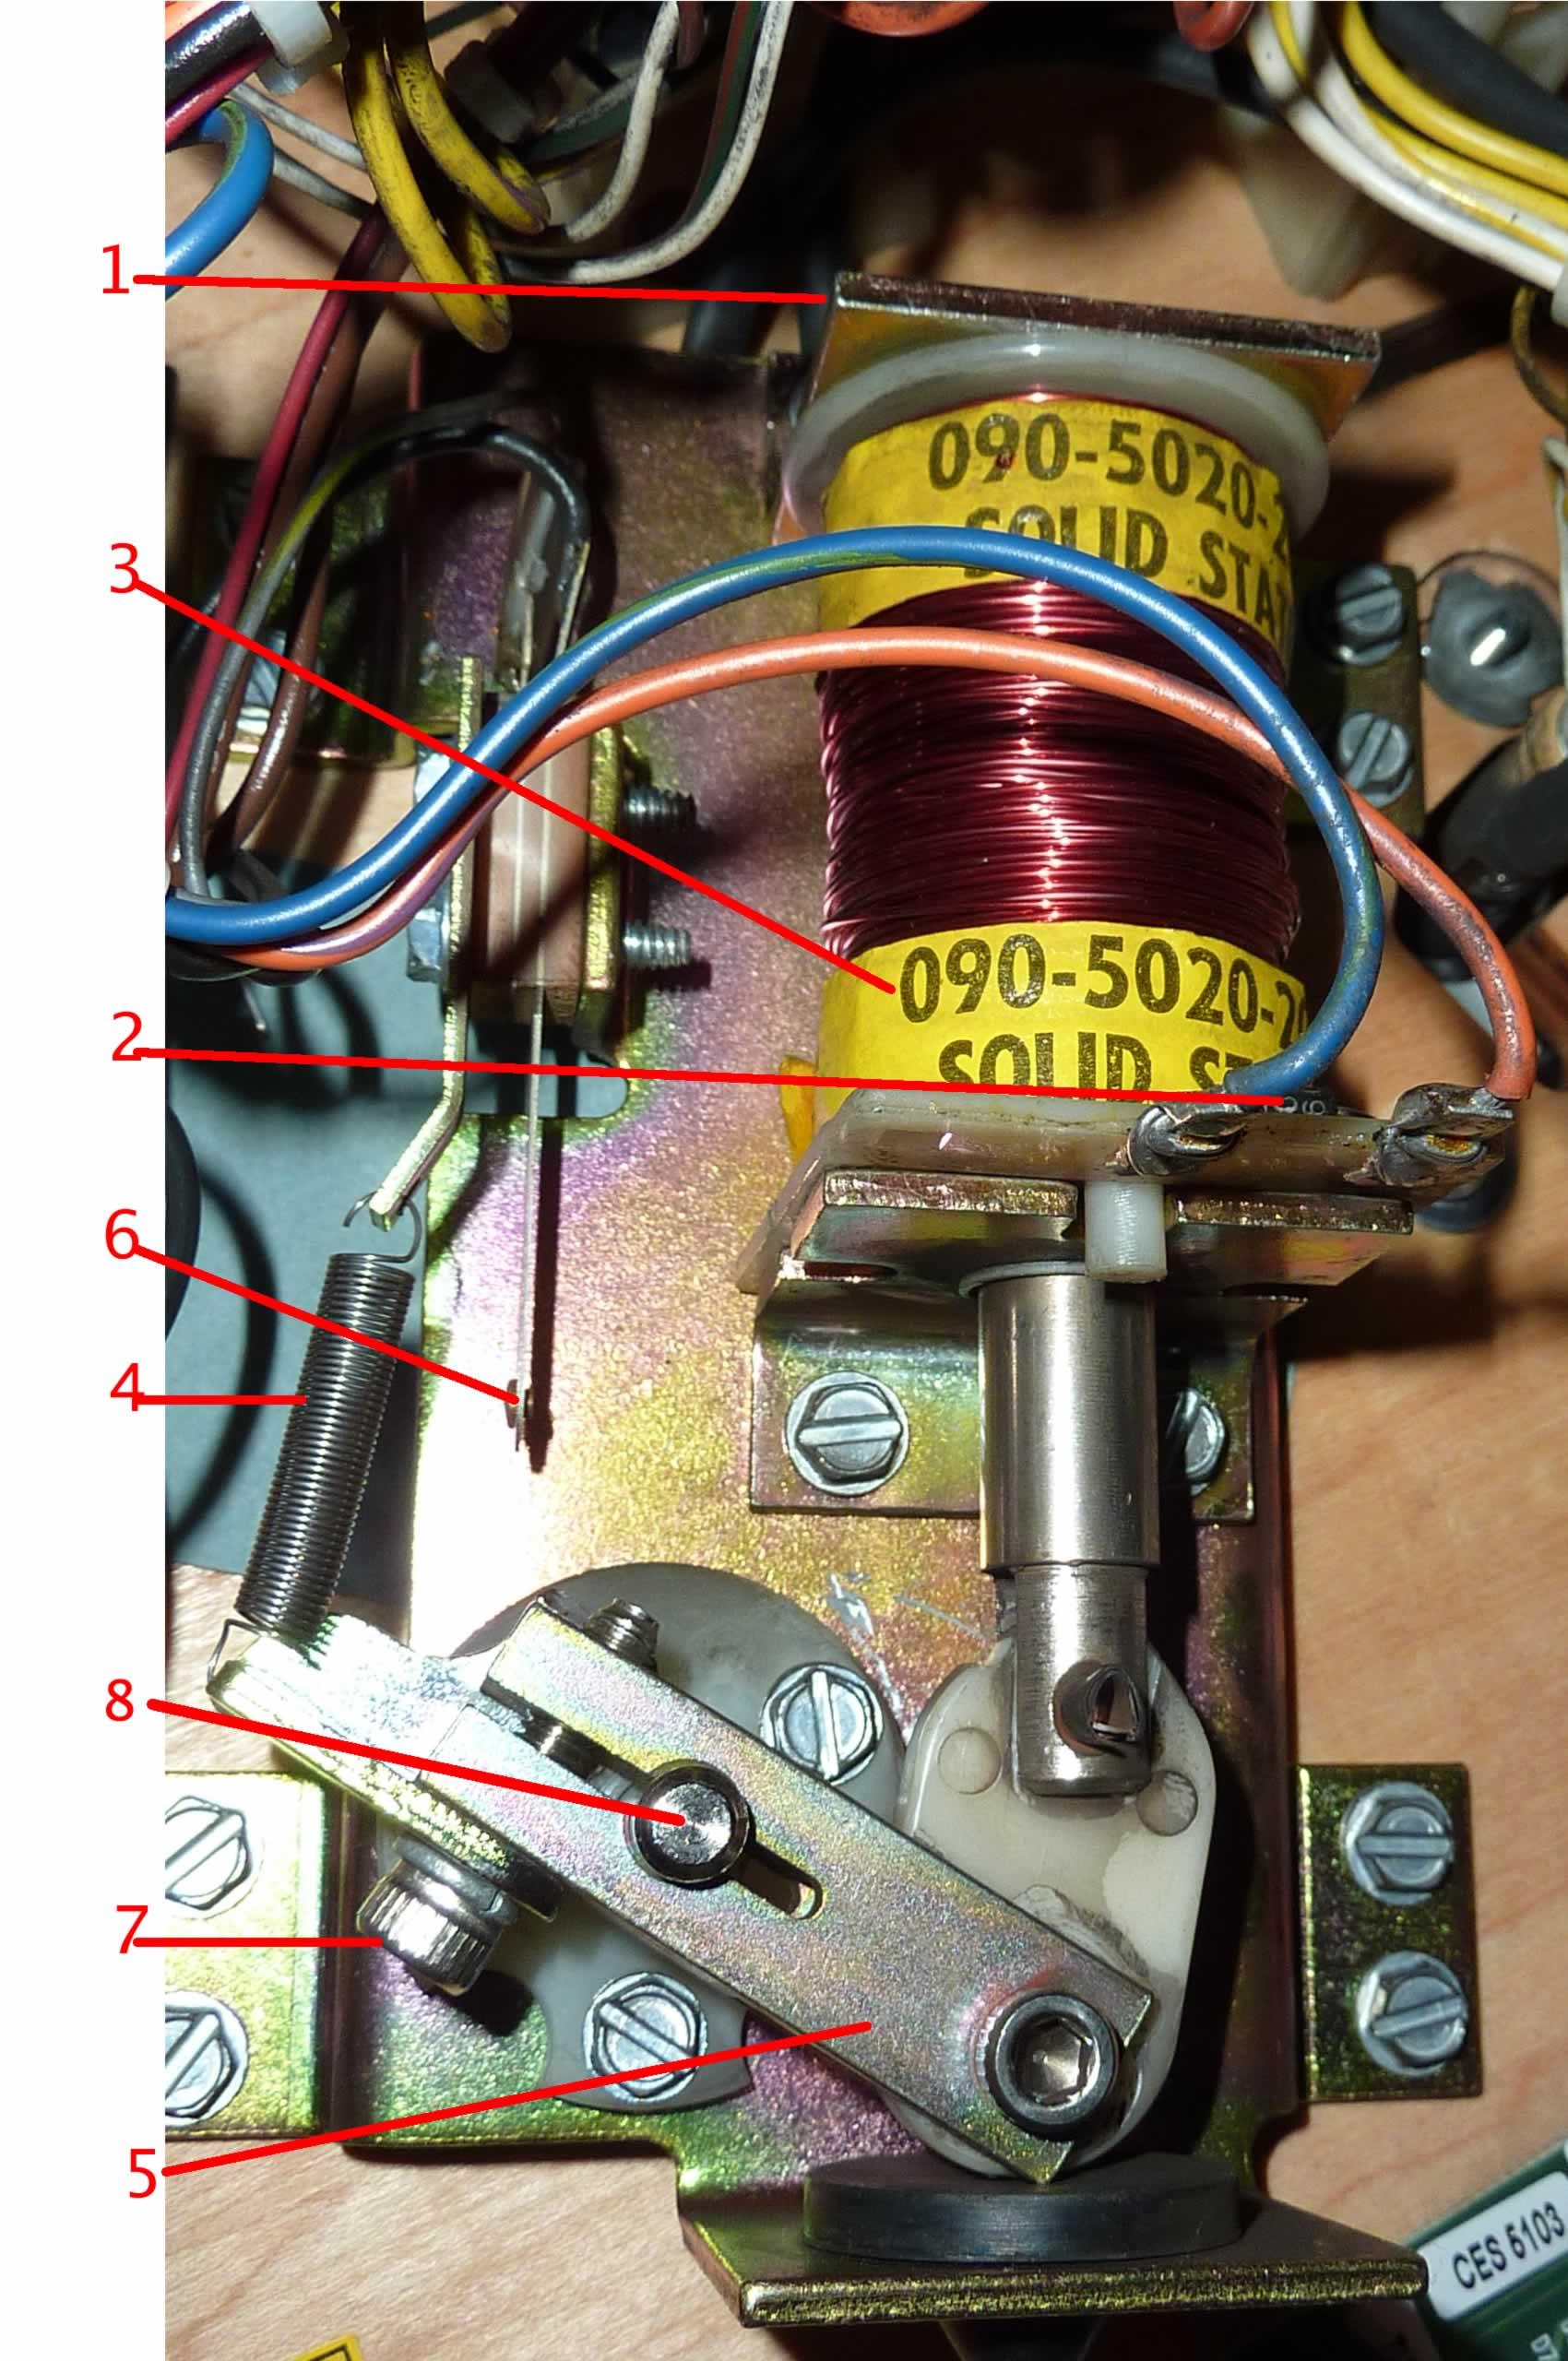 Pinball Machine Flipper Coil Wiring On Standard Wiring Diagram